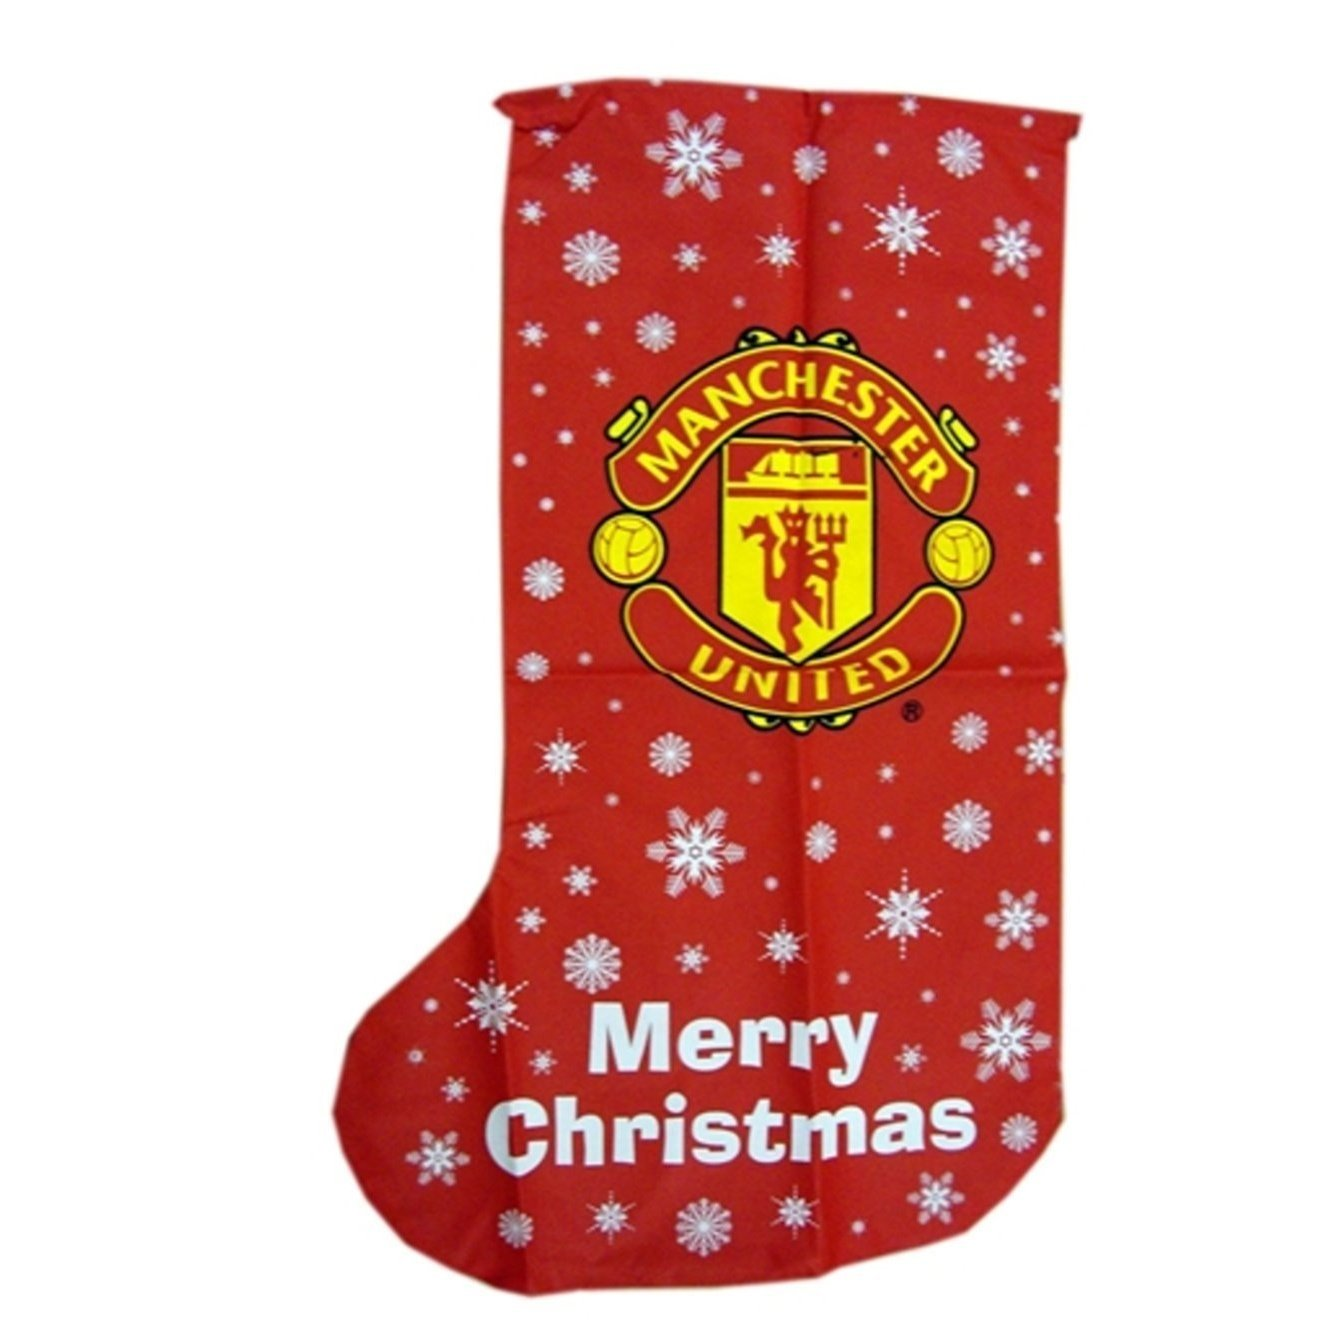 Manchester United Novelty Christmas Jumbo Present Stocking (One Size) (Red) UTMS212_1